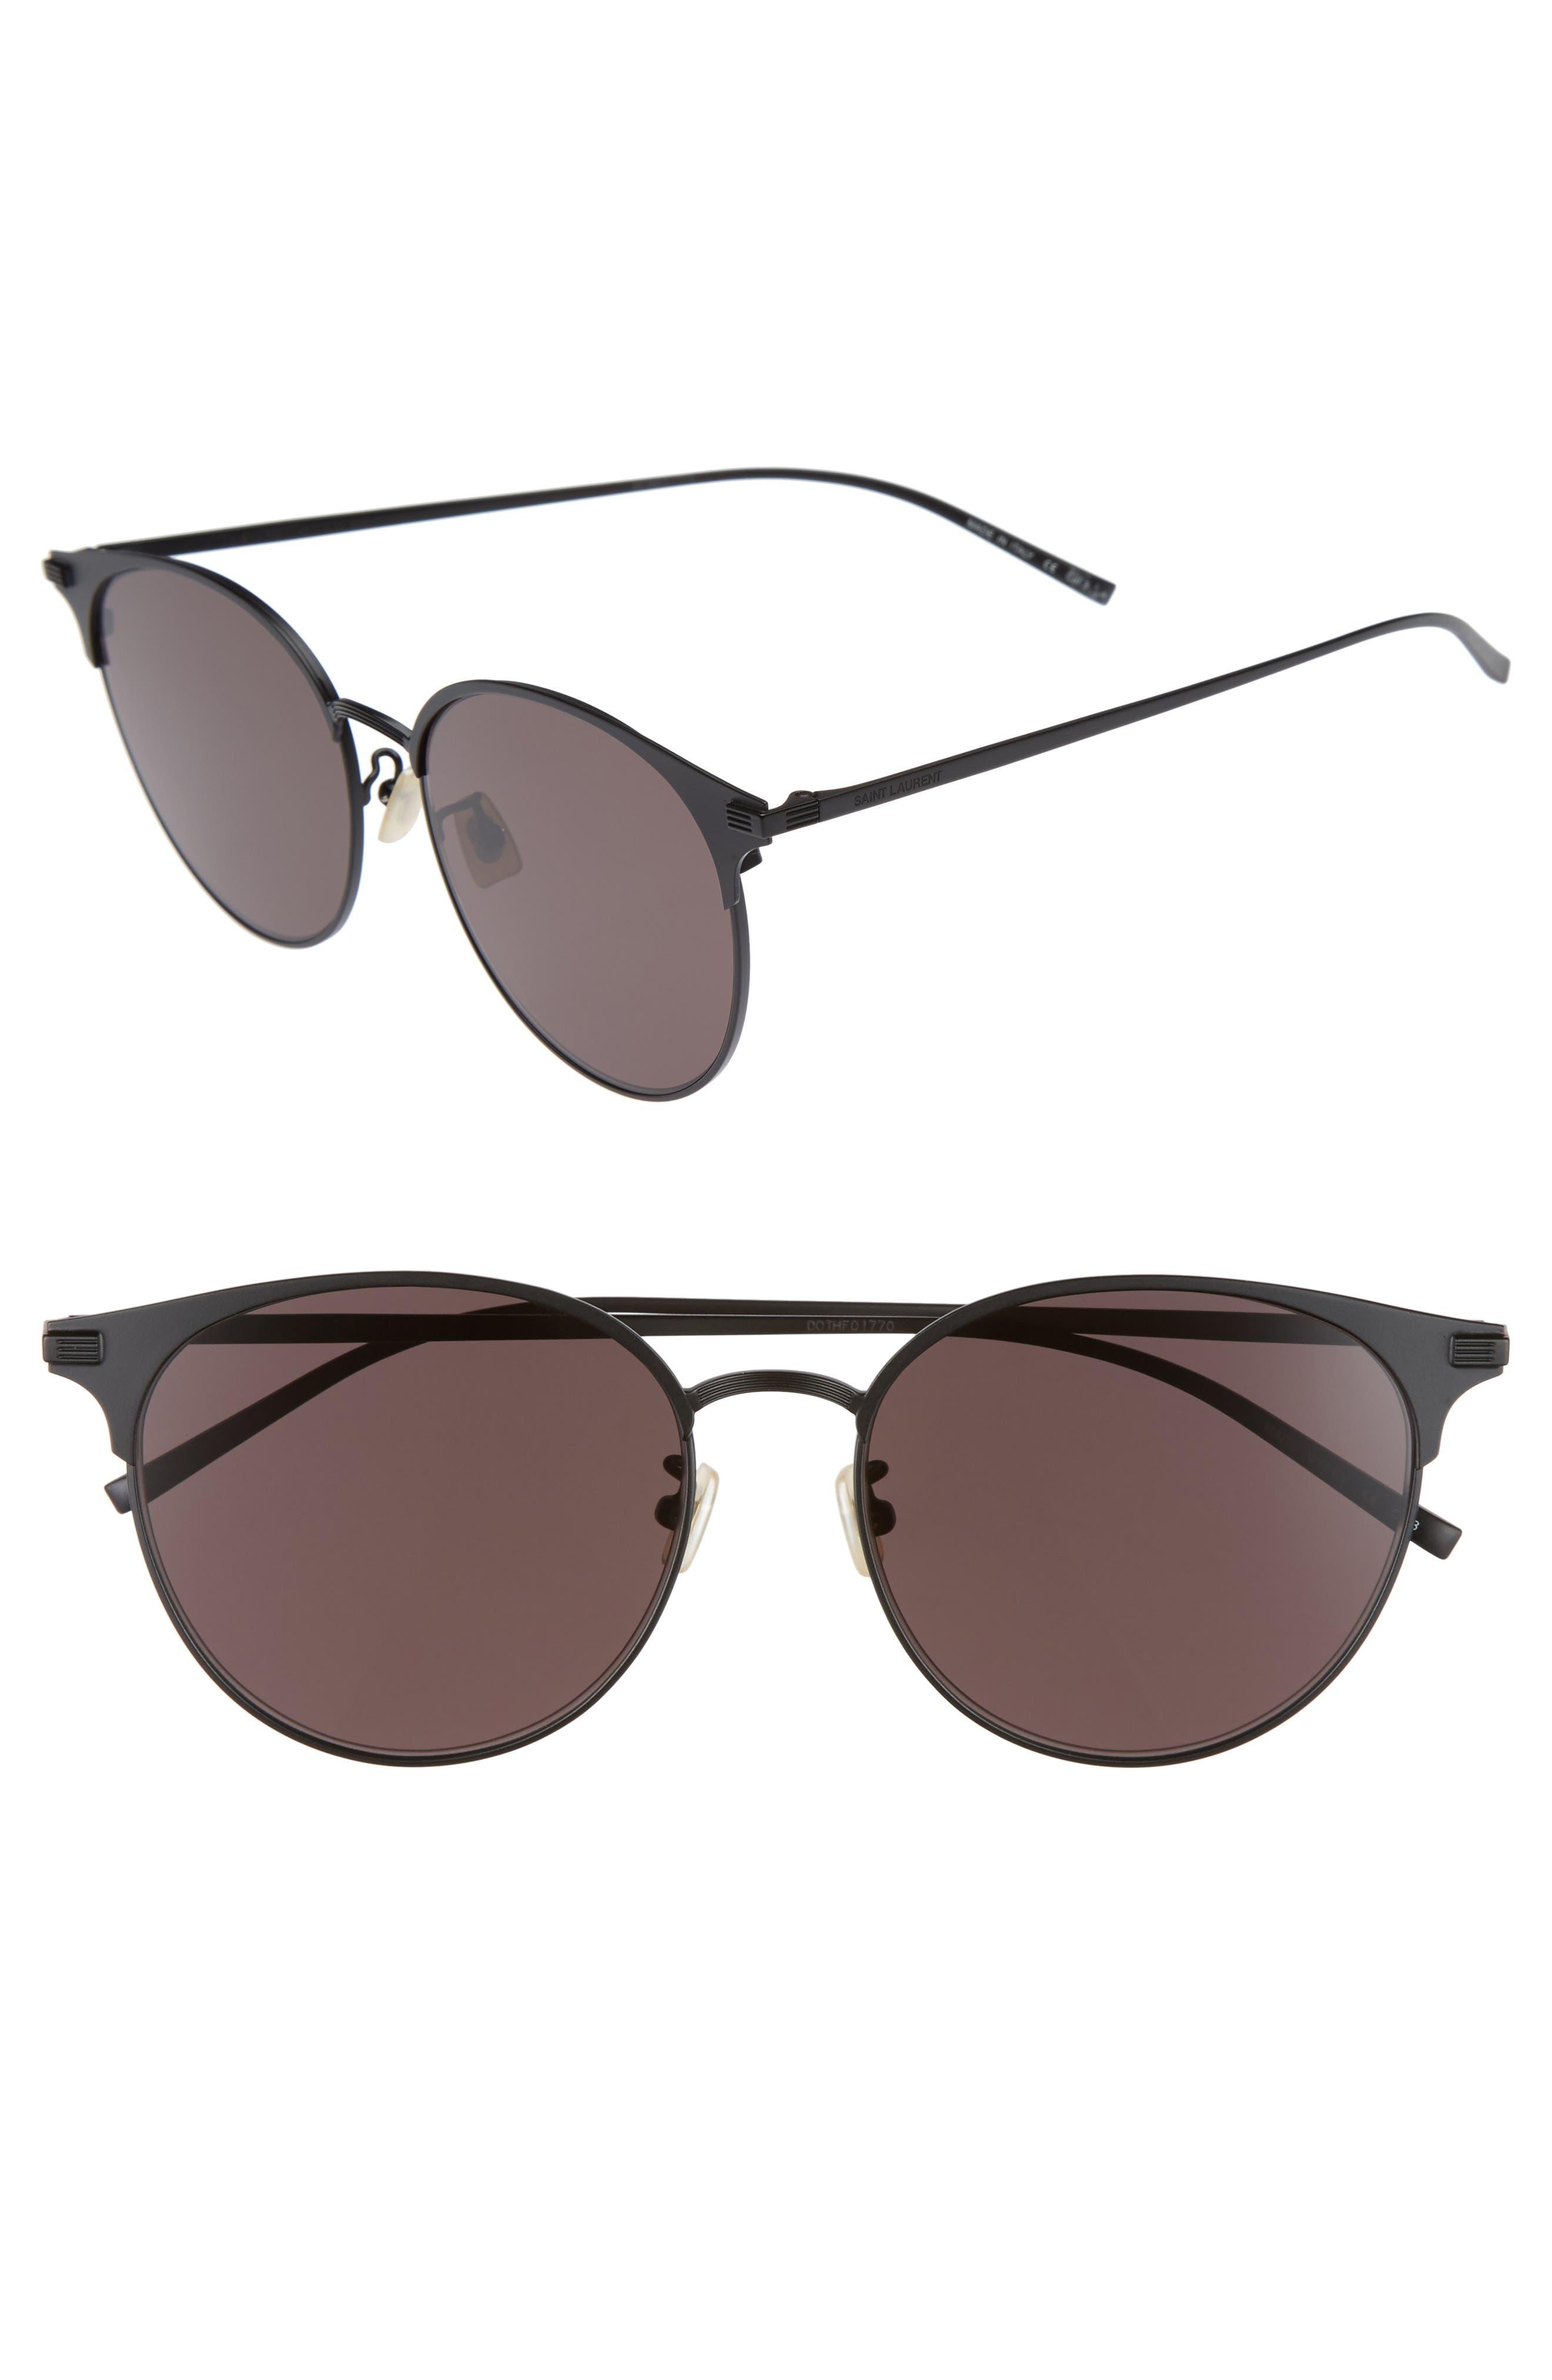 57mm Sunglasses,                             Main thumbnail 1, color,                             BLACK